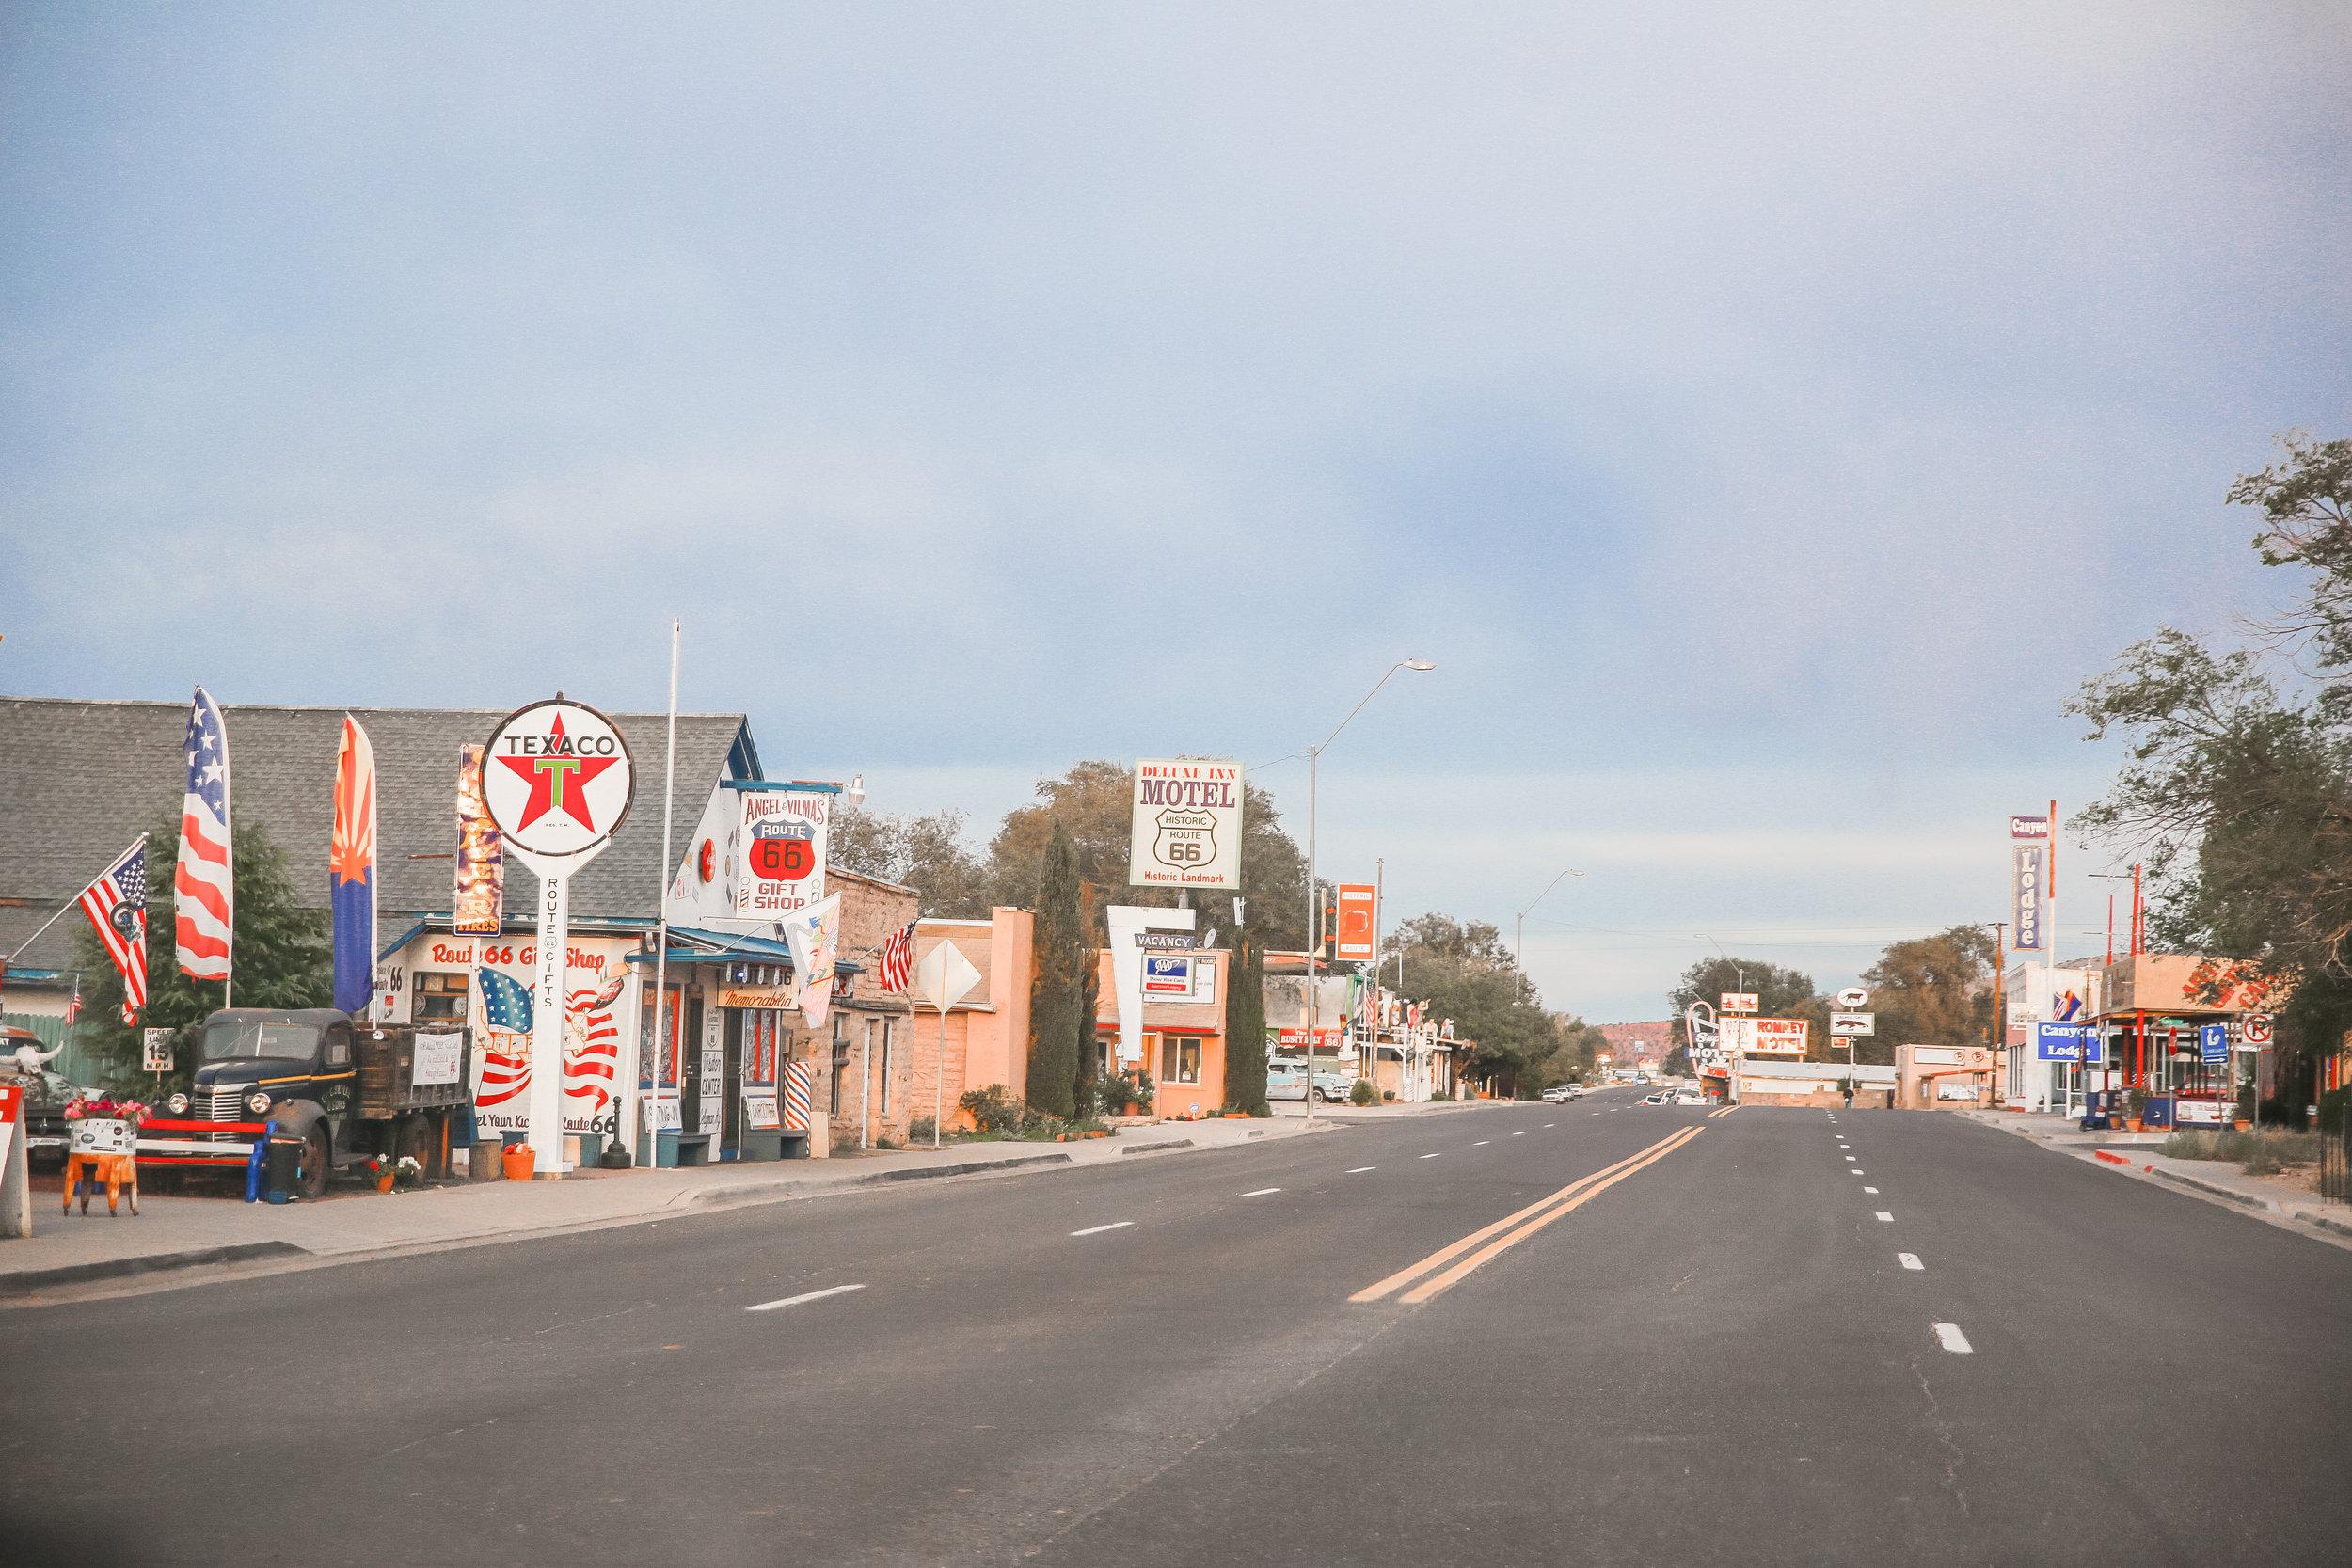 Got our kicks on Route 66.